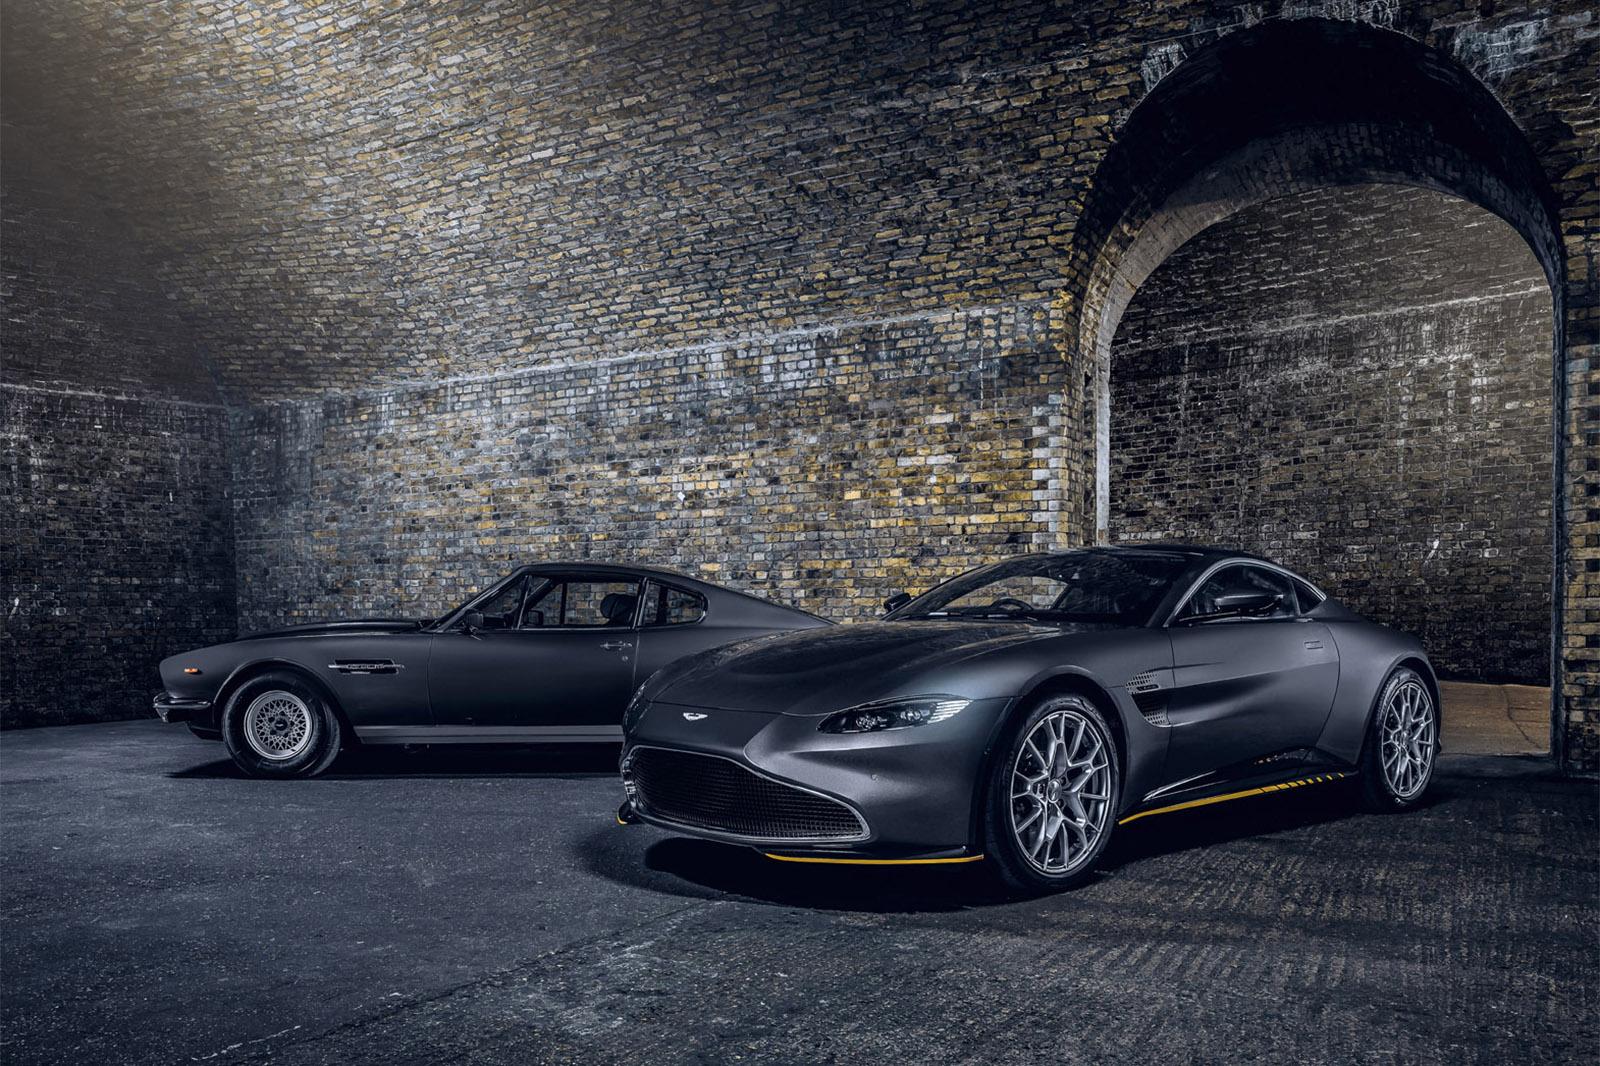 Aston Martin 007 Edition Models Celebrate New James Bond Film Autocar